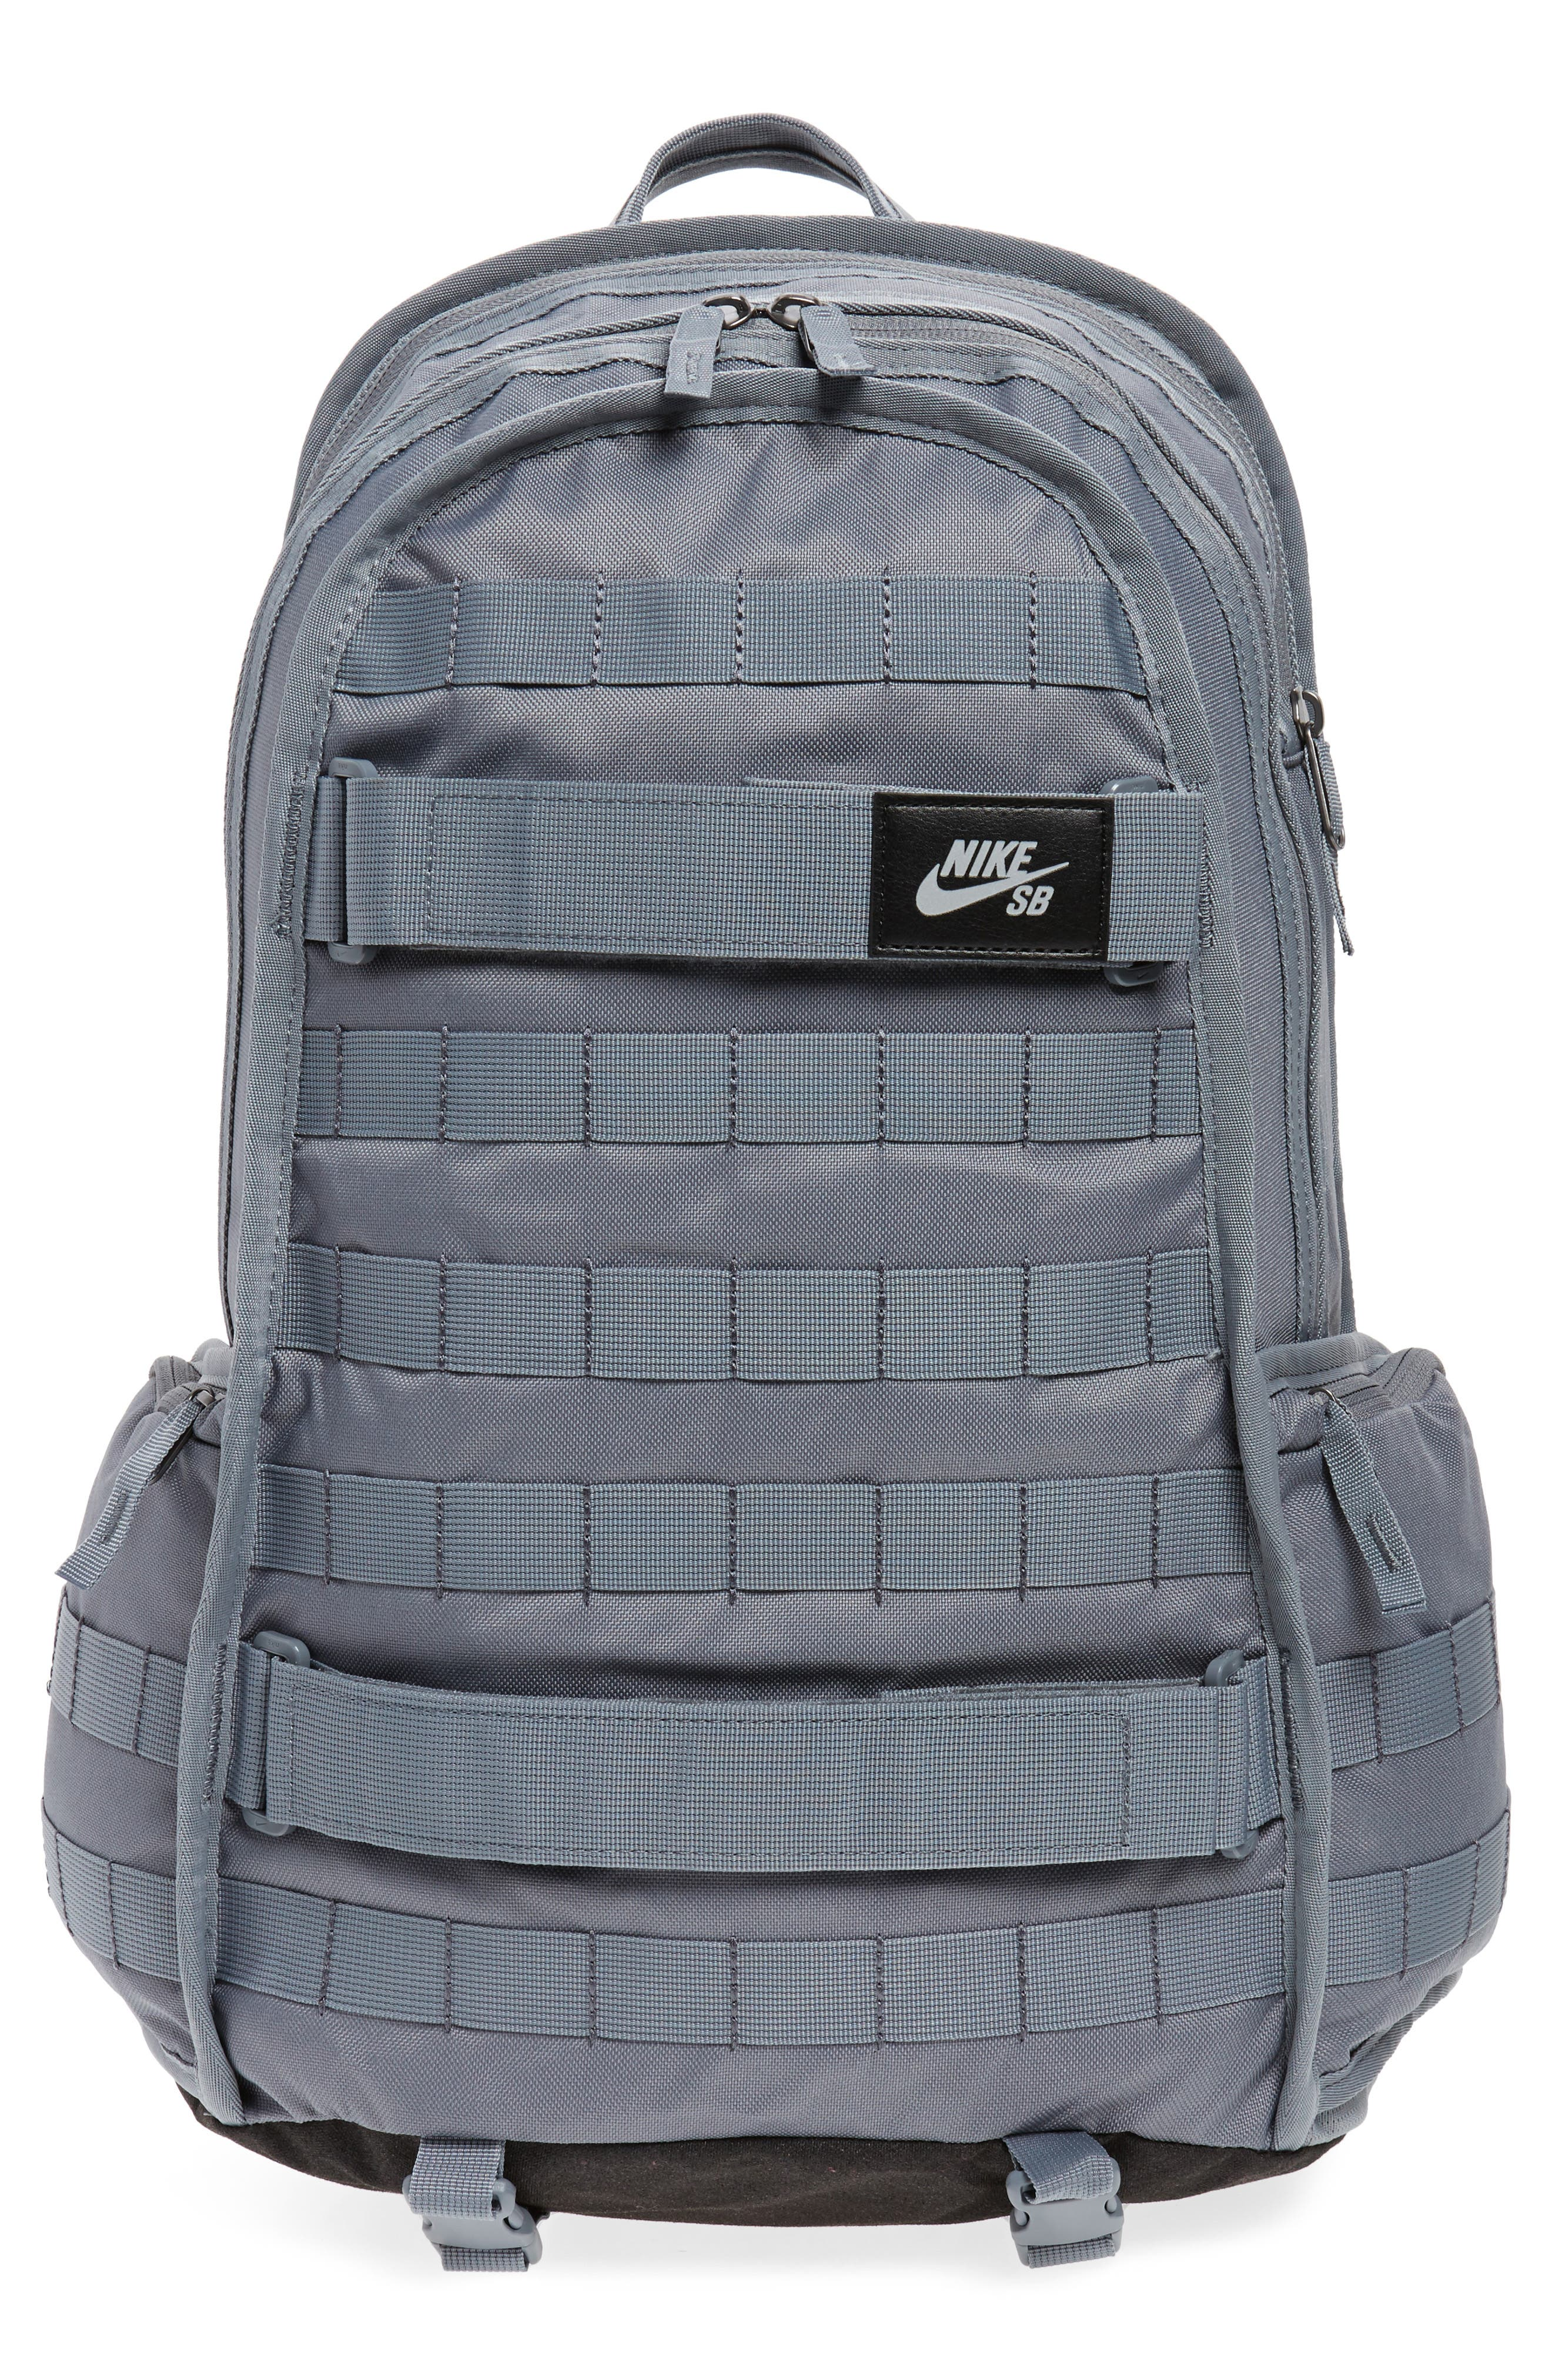 Main Image - Nike SB RPM Backpack